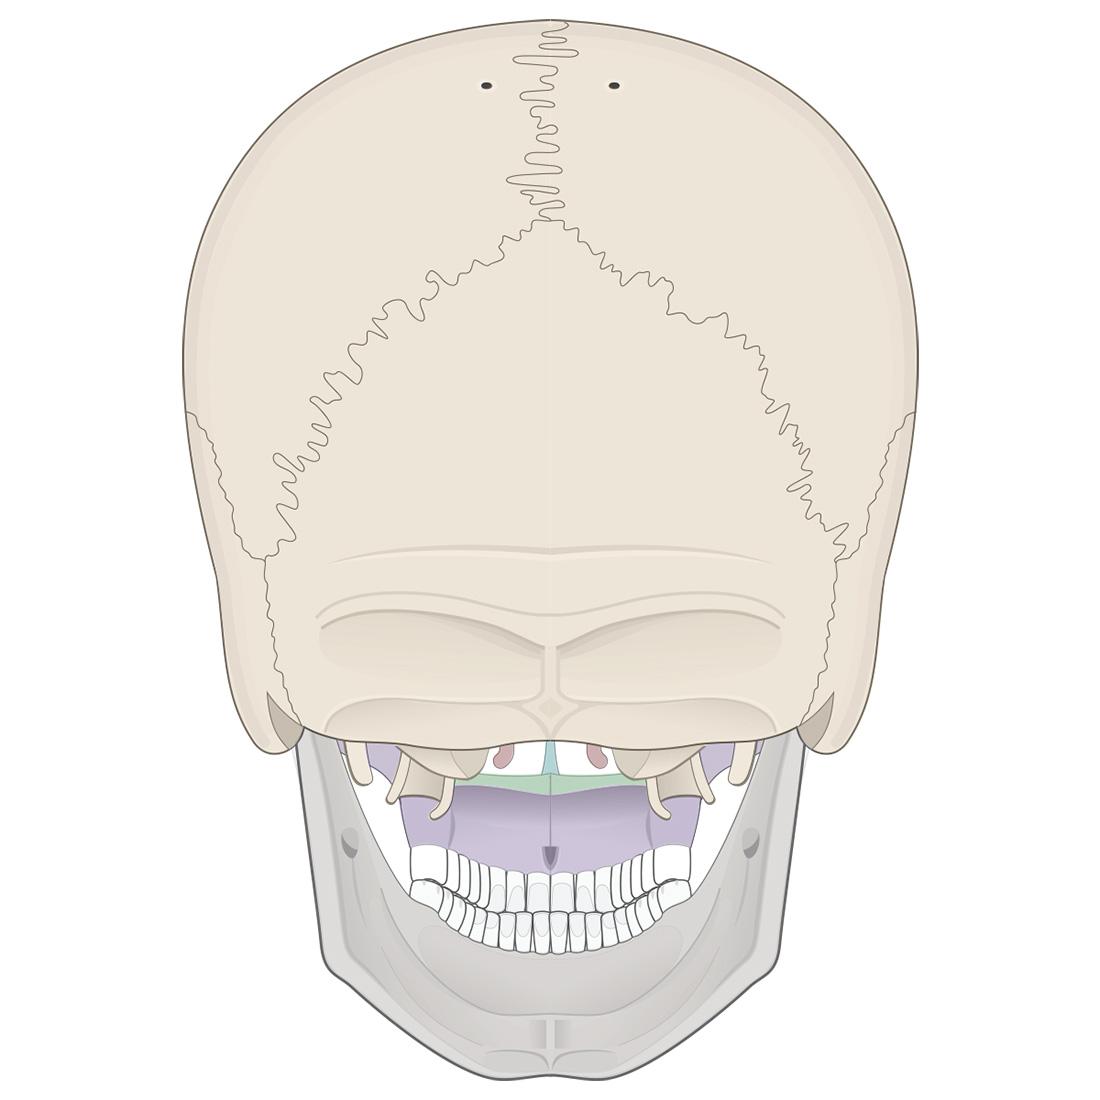 Facial bones: posterior view of the skull